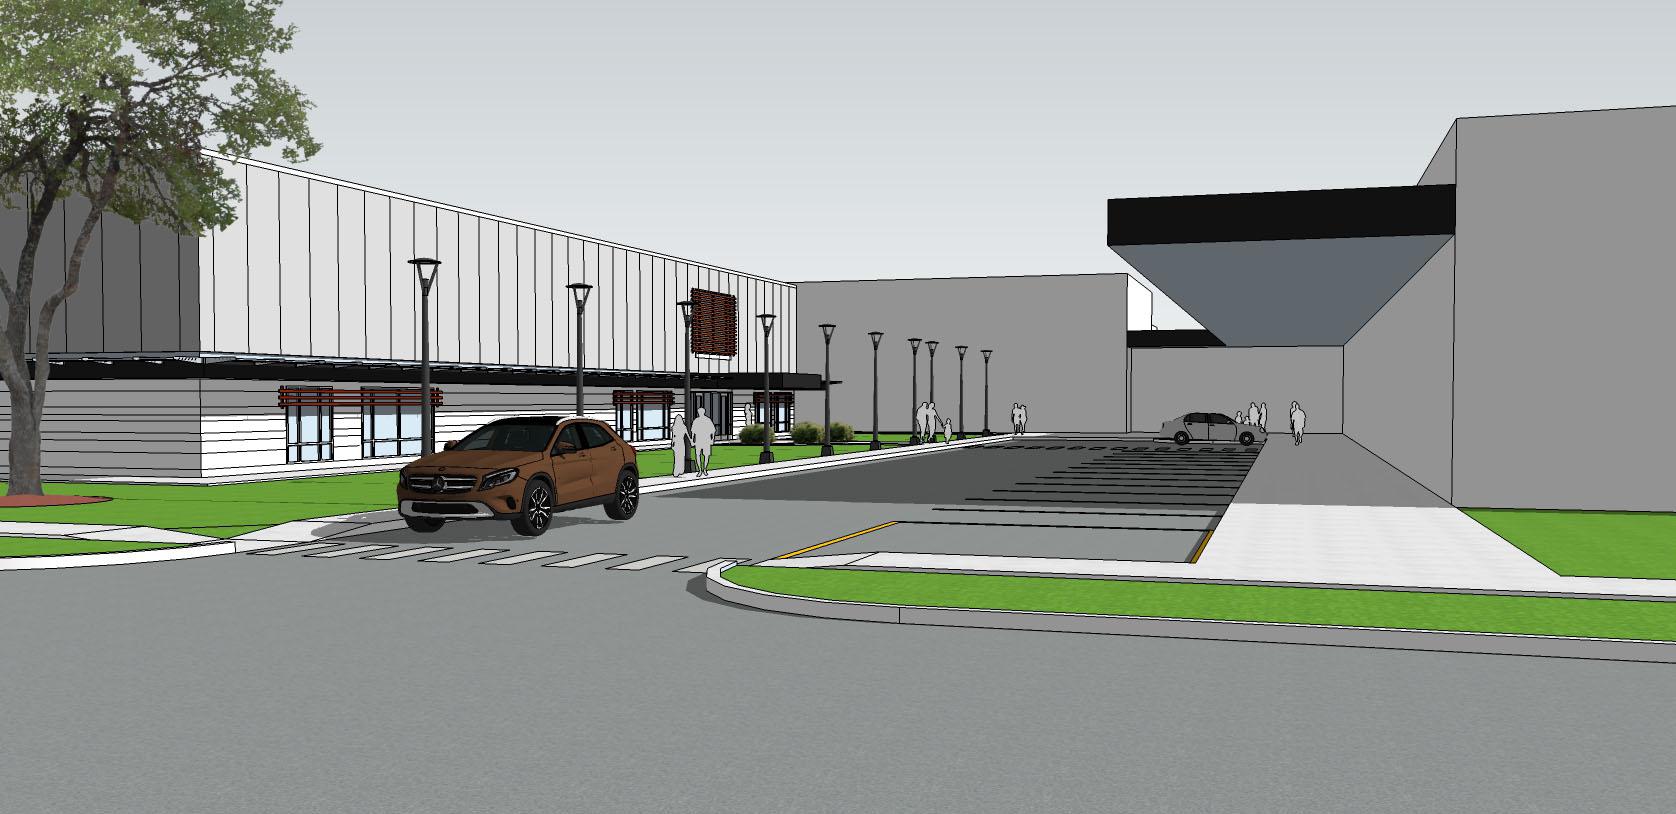 Health Sciences Building - Bishop State Community College - Bishop State Foundation - Mobile AL